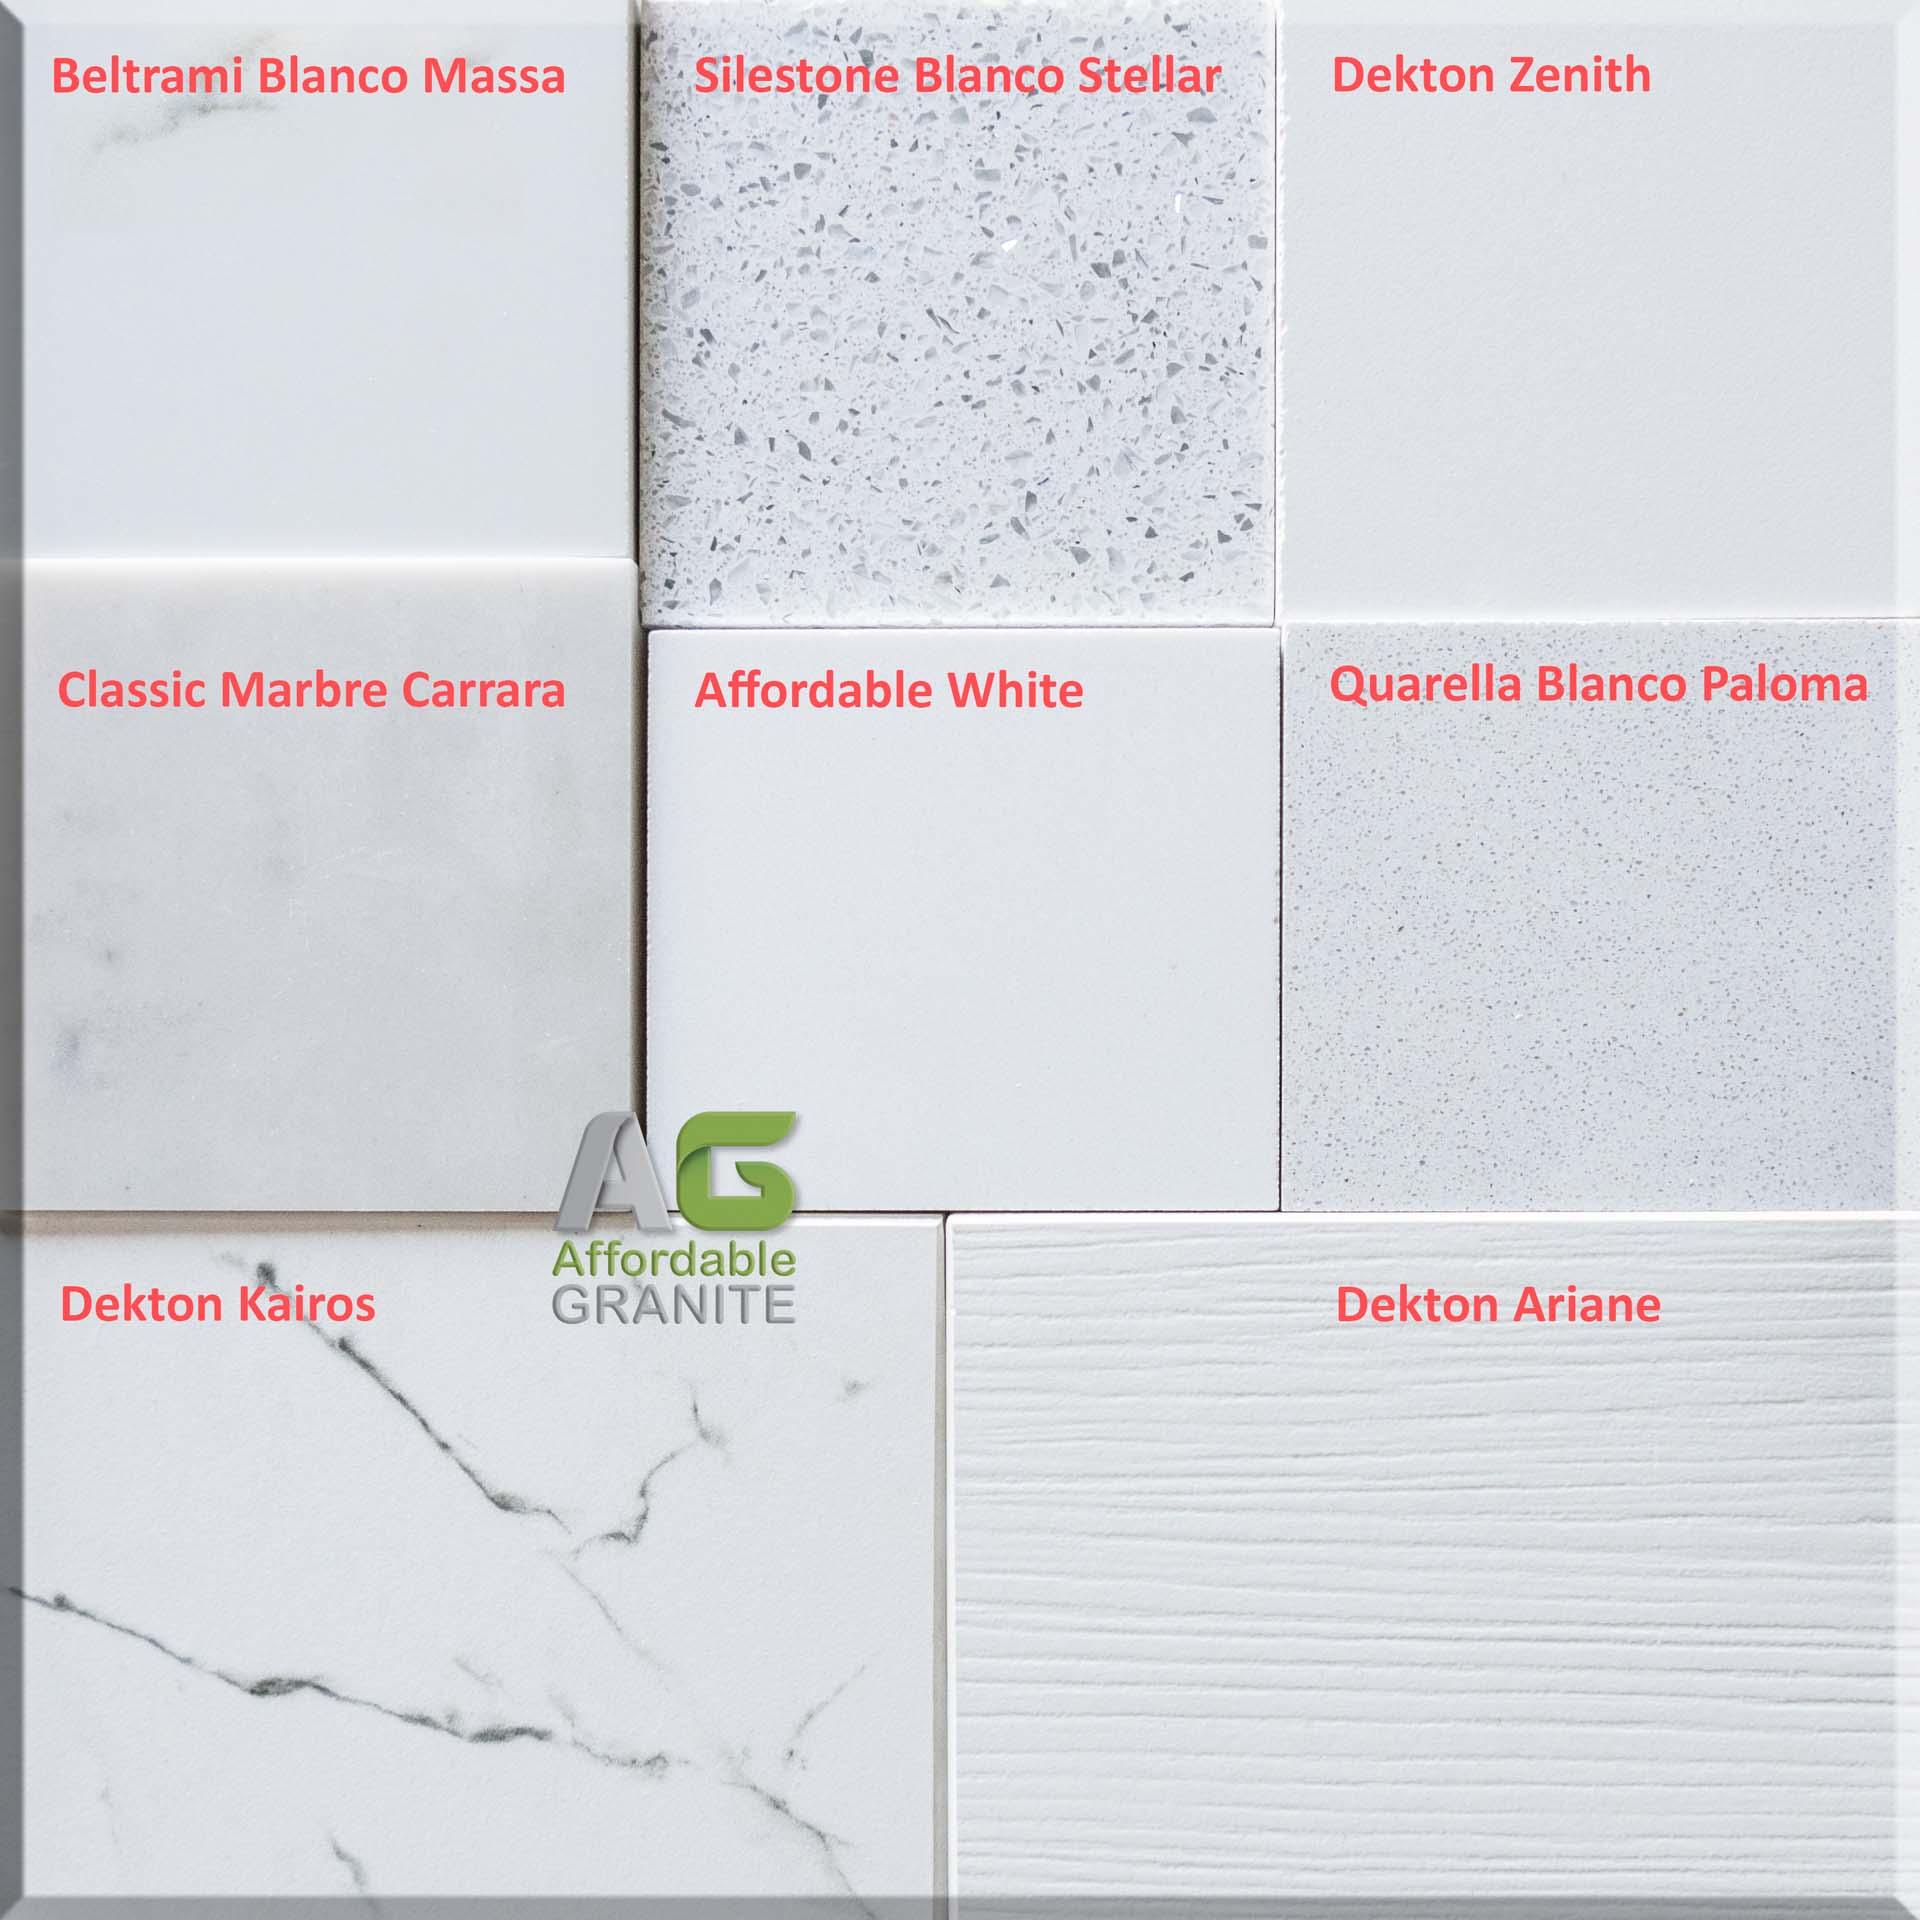 150930 beltrami blanco massa dekton zenith kairos ariane silestone blanco stellar affordable white